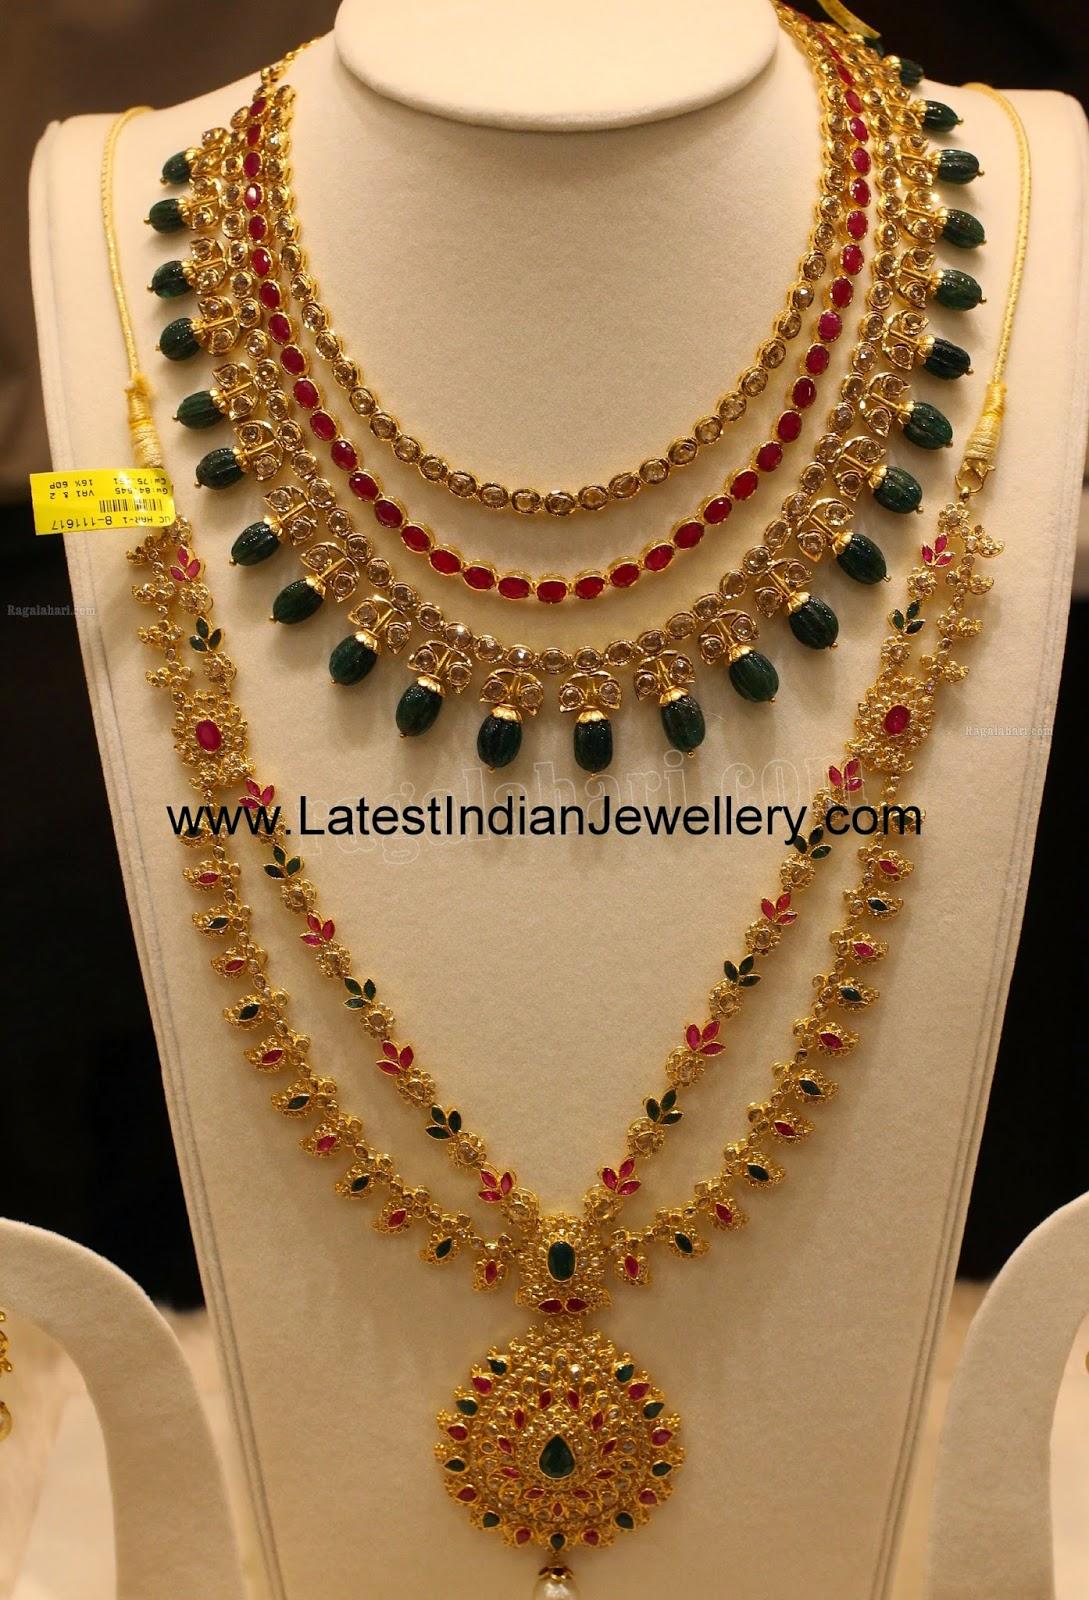 Manepally Designer Uncut Diamond Collection